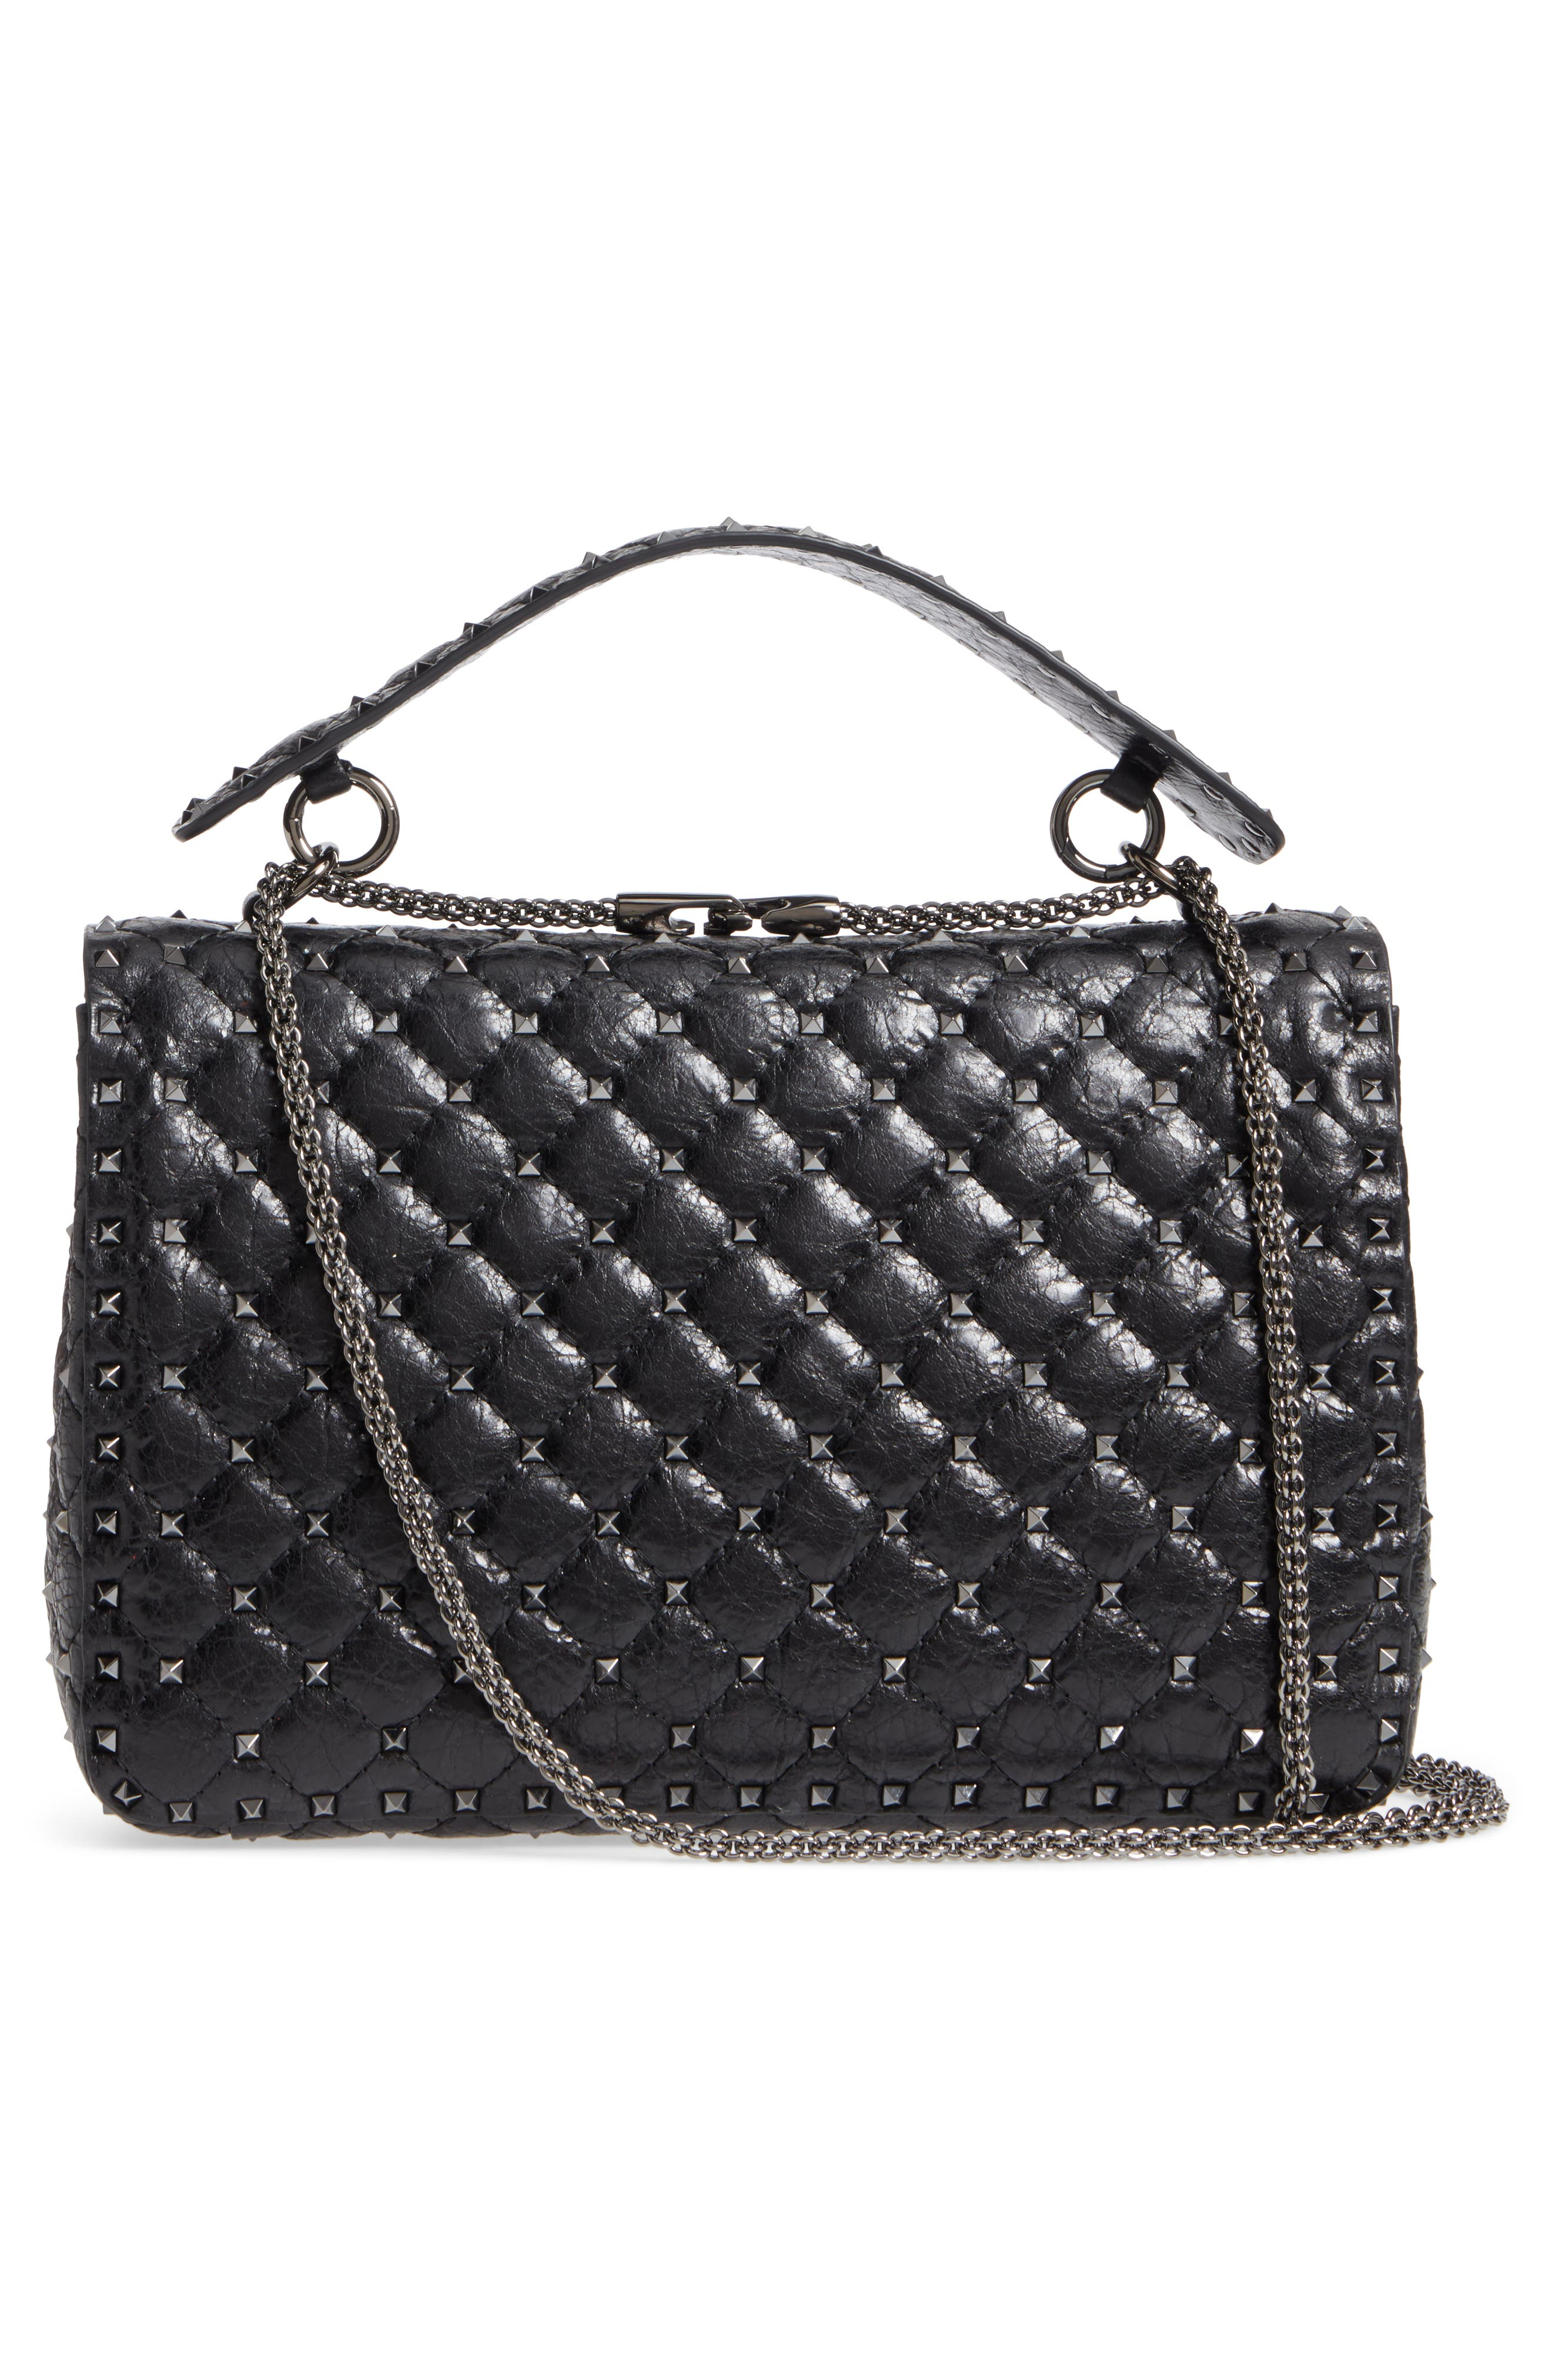 Vitello Rockstud Lambskin Leather Shoulder Bag,                             Alternate thumbnail 3, color,                             001